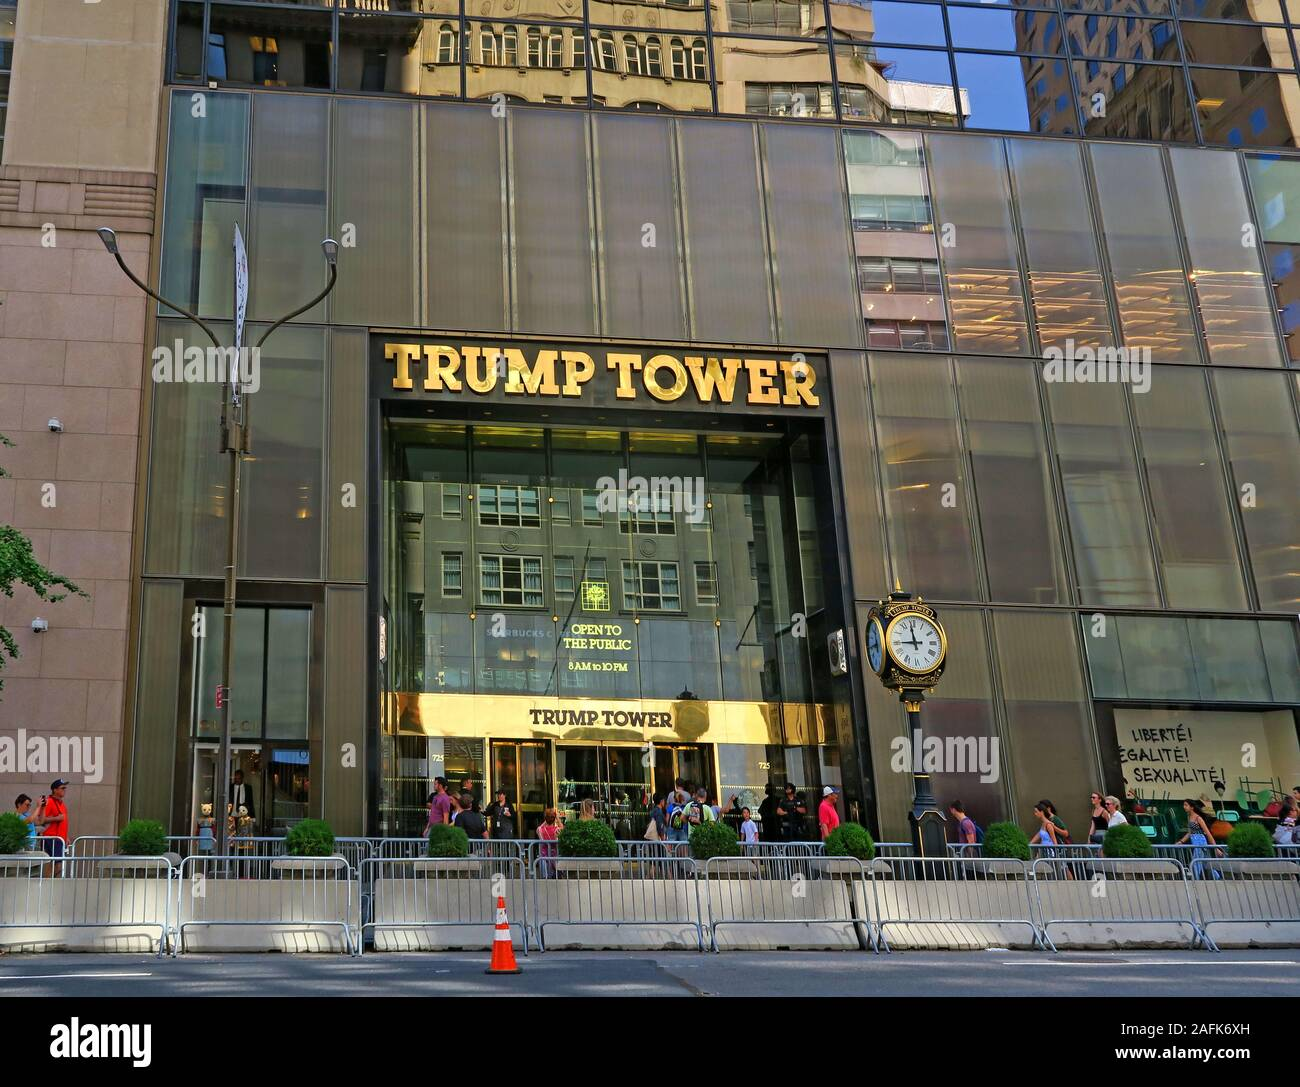 HotpixUK,@HotpixUk,GoTonySmith,NYC,NY,New York,USA,city,city centre,US,725 5th Ave,NY 10022,United States,Trump,Trump tower,Donald Trump,building,gold,architecture,Trump Organisation,POTUS,Der Scutt,Poor,Swanke,Hayden & Connell,Midtown Manhattan,penthouse condominium residence